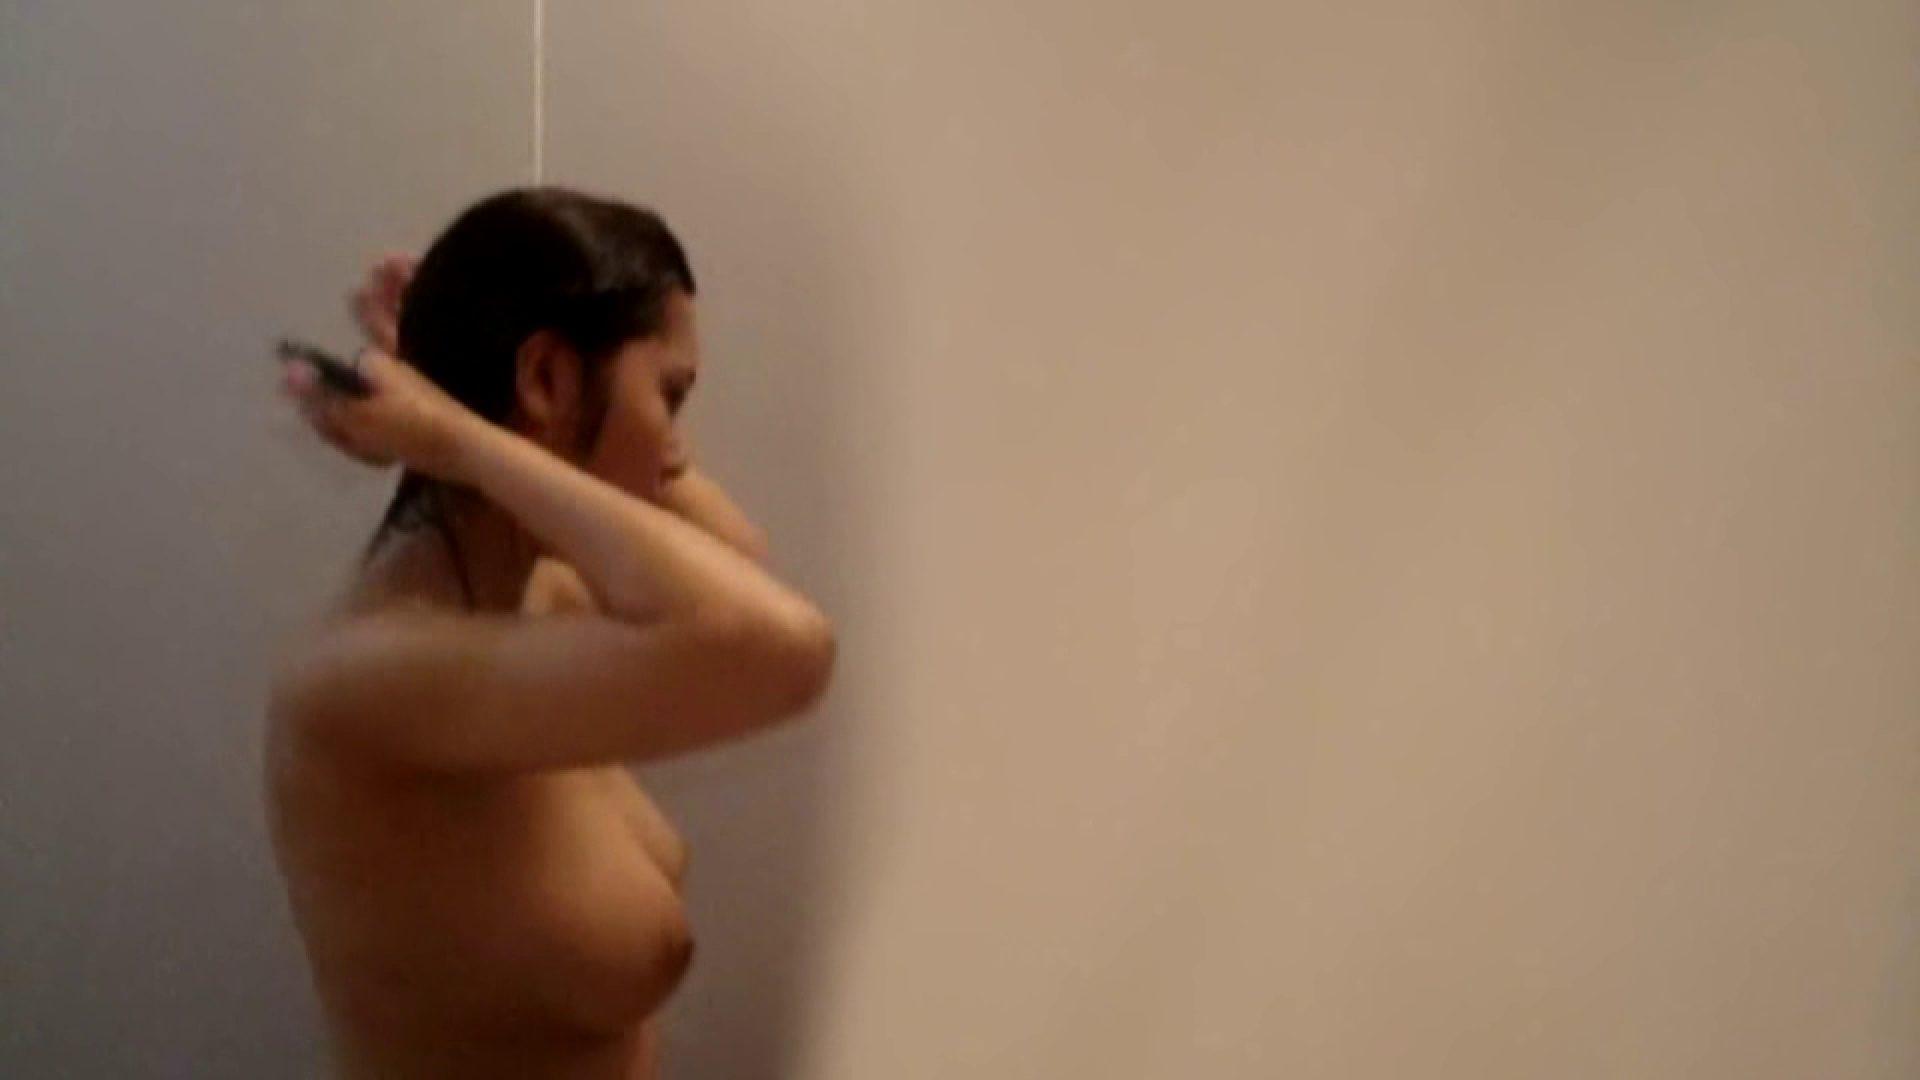 vol.2 葵のグラドル顔負けの爆乳を入浴シーンでどうぞ。 民家 オマンコ無修正動画無料 110枚 68